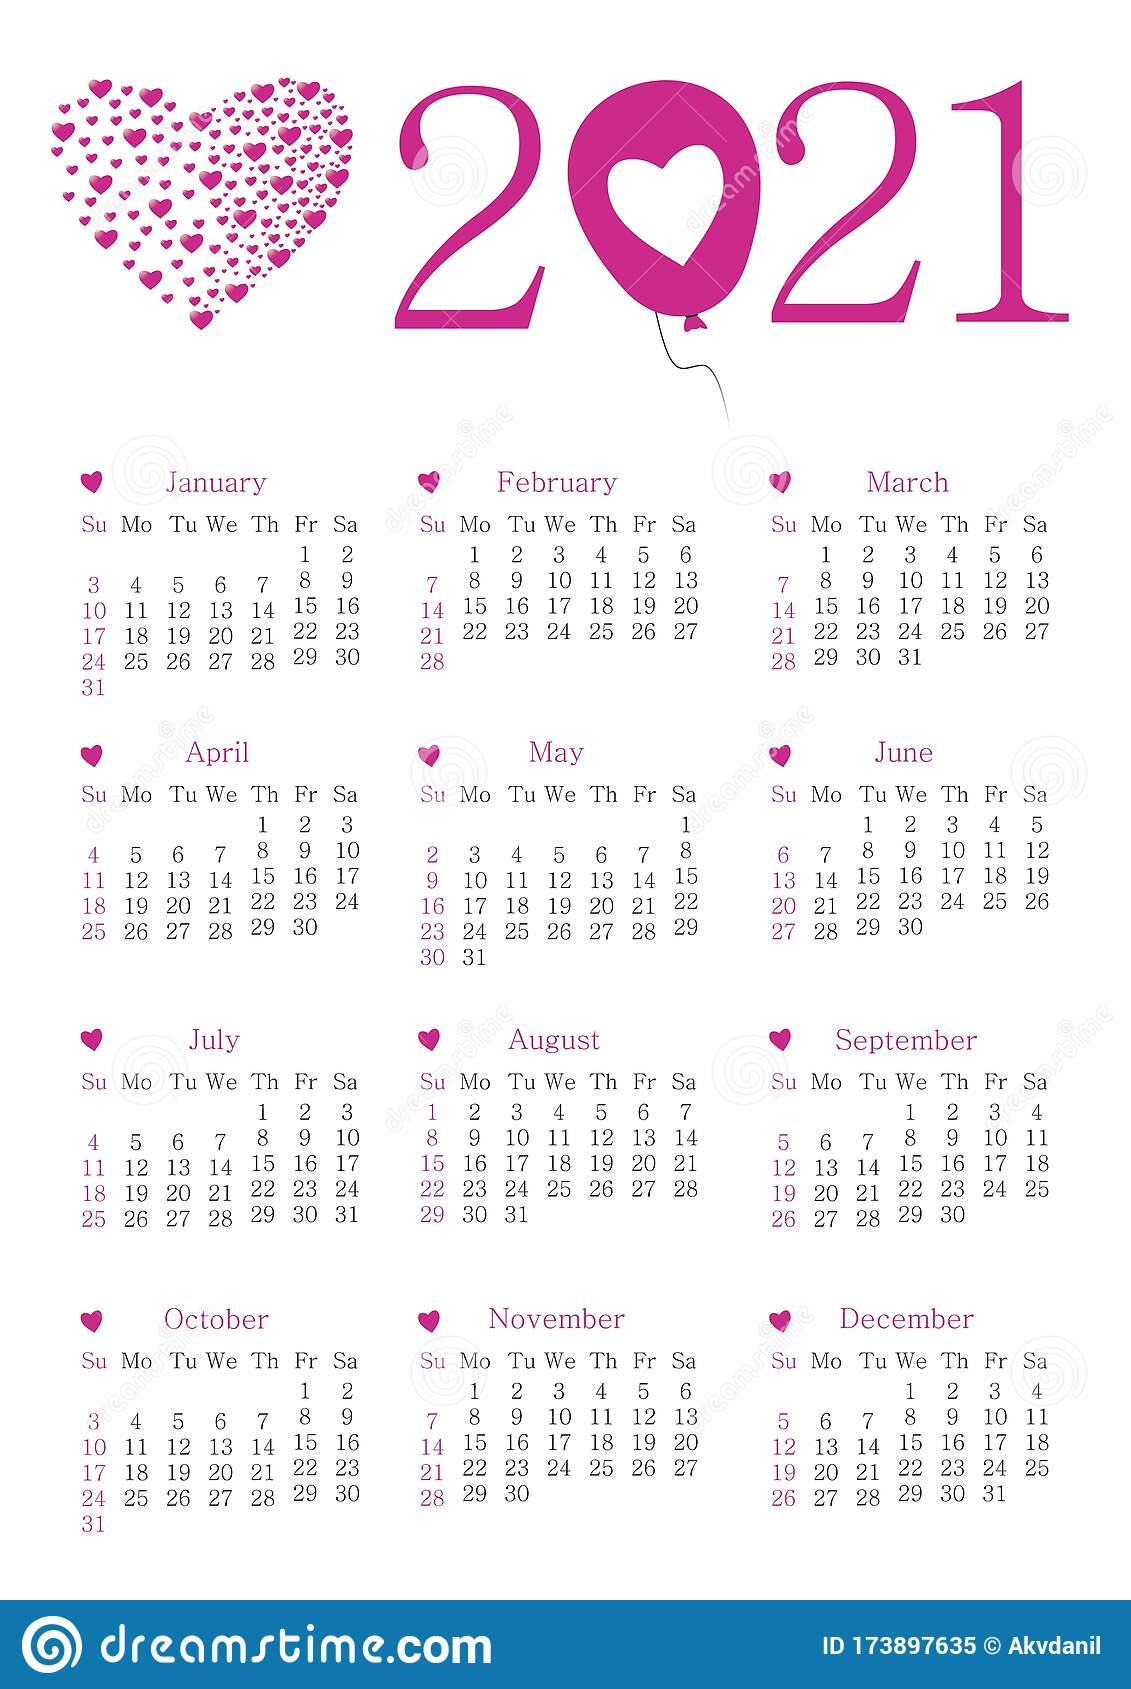 Calendar For 2021 Stock Vector. Illustration Of Championship